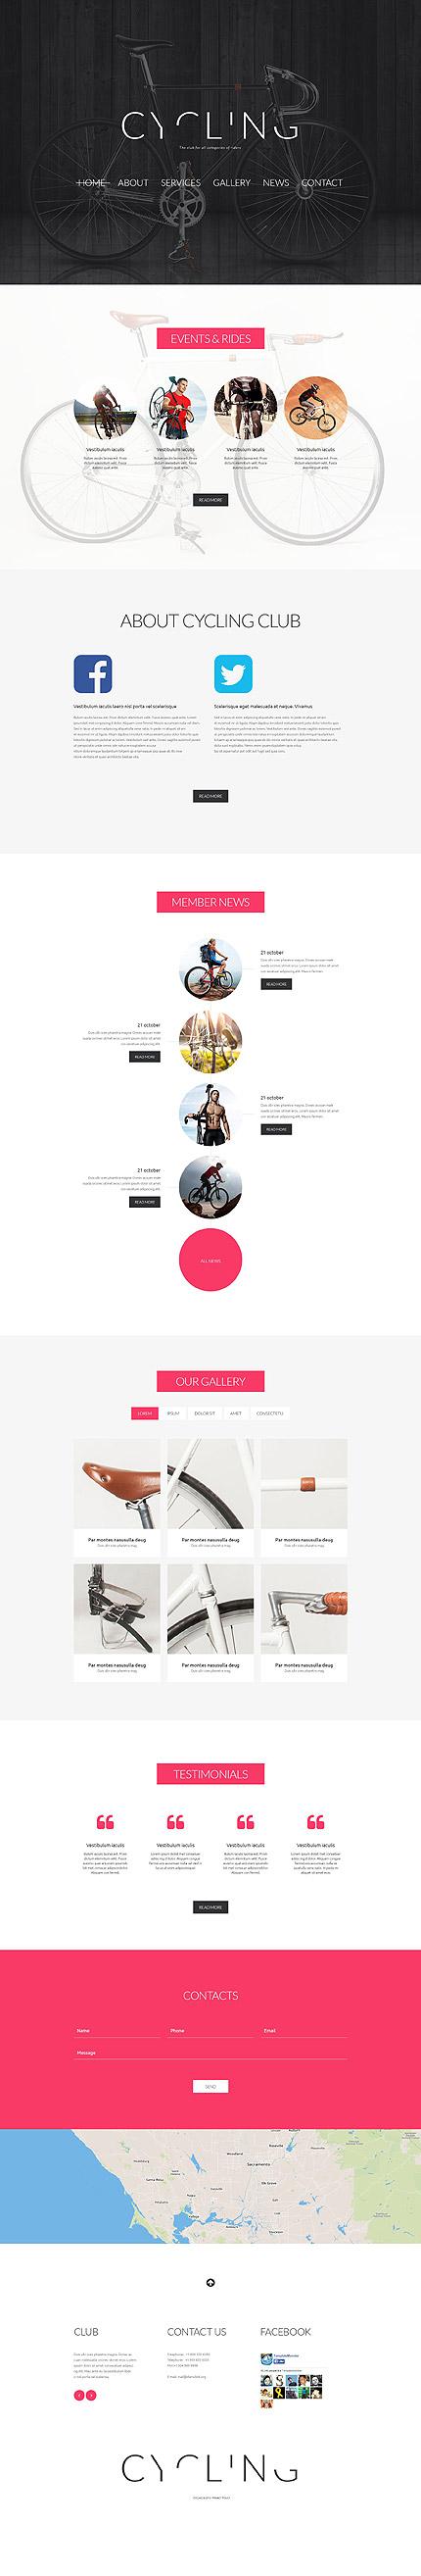 Joomla Theme/Template 52757 Main Page Screenshot